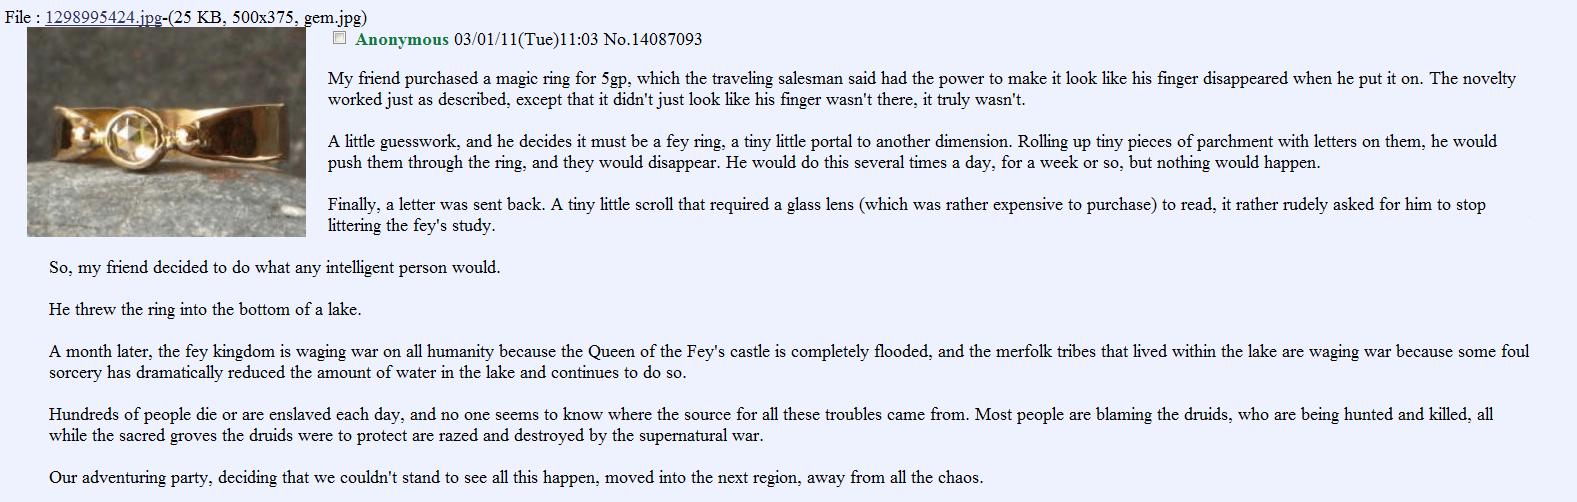 4chan RPG